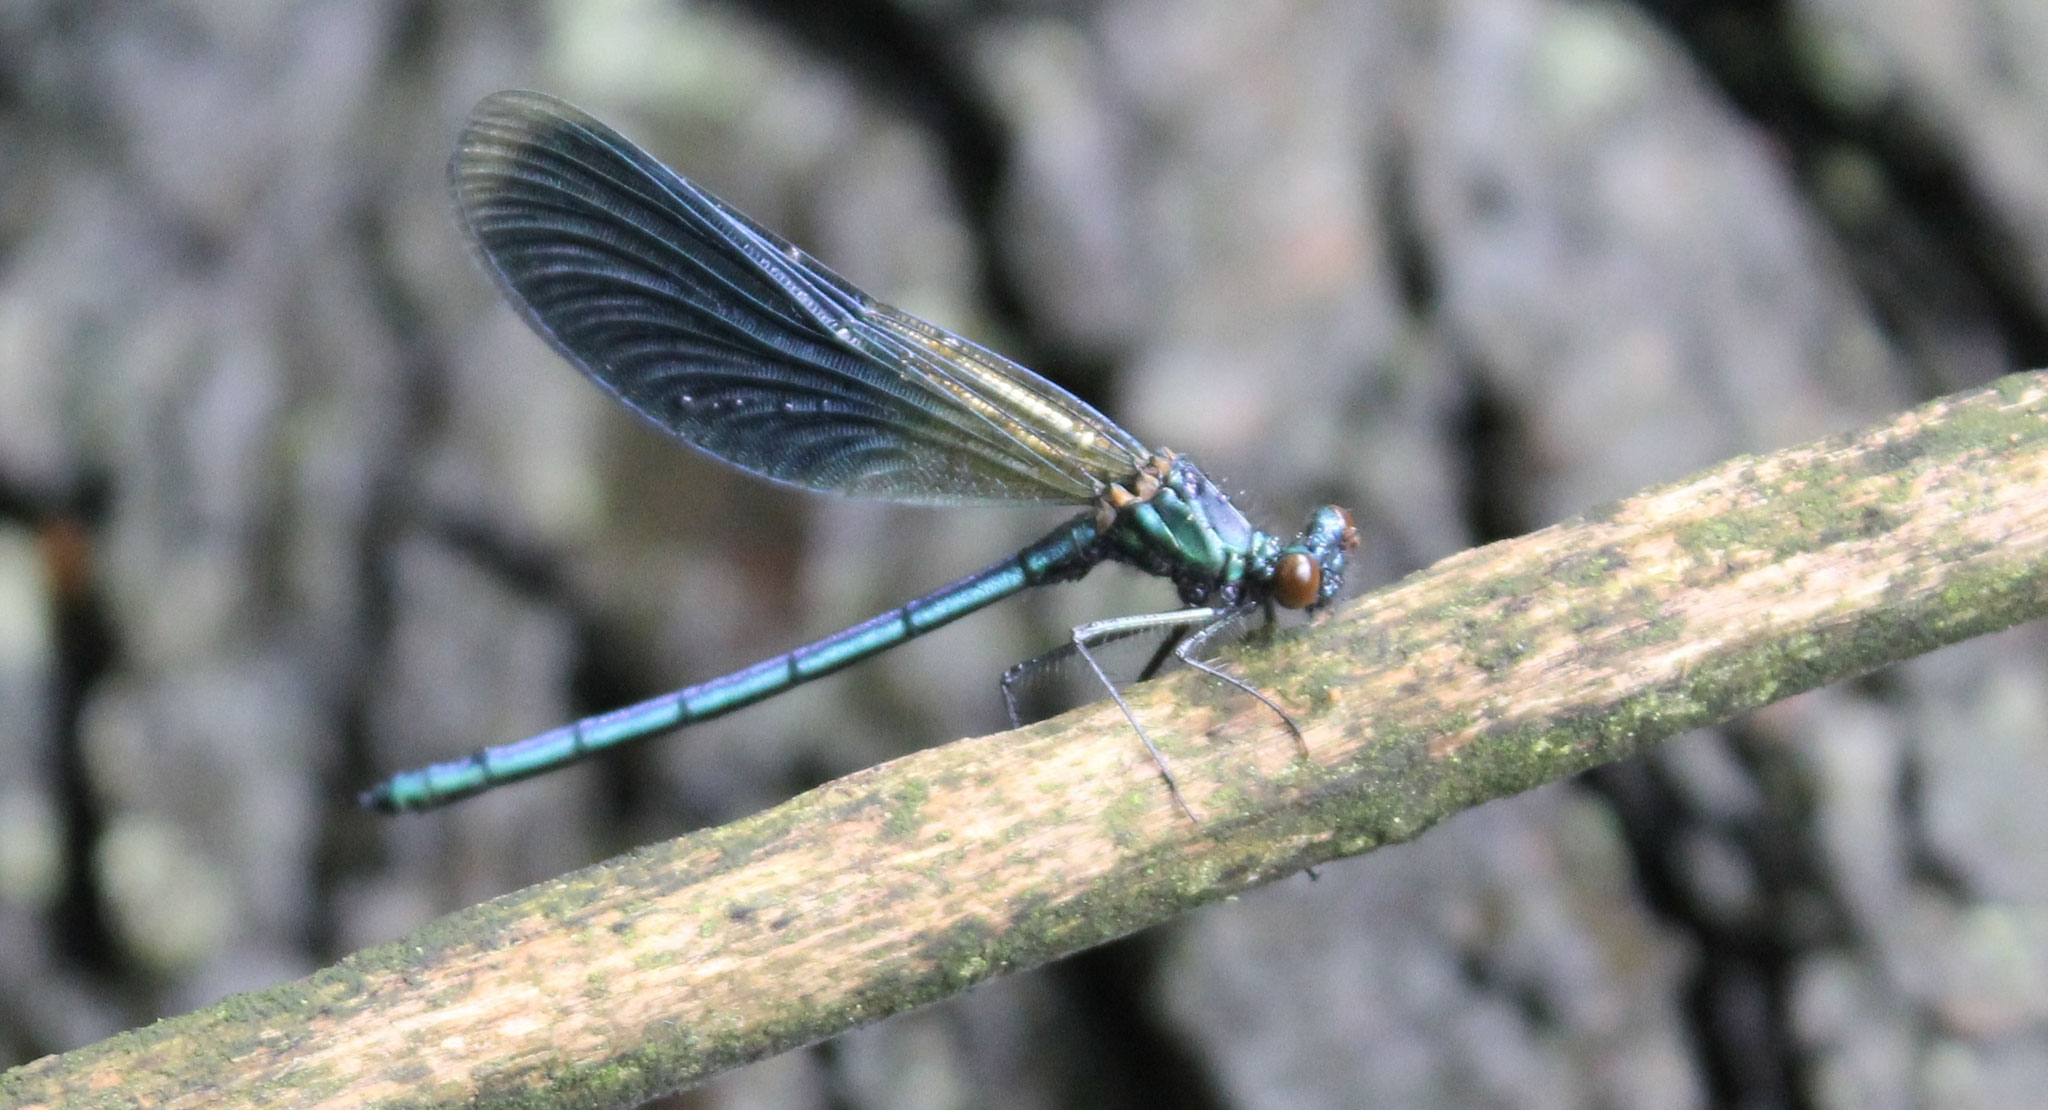 Männchen der Gebänderten Prachtlibelle (Calopteryx splendens) an der Alster.